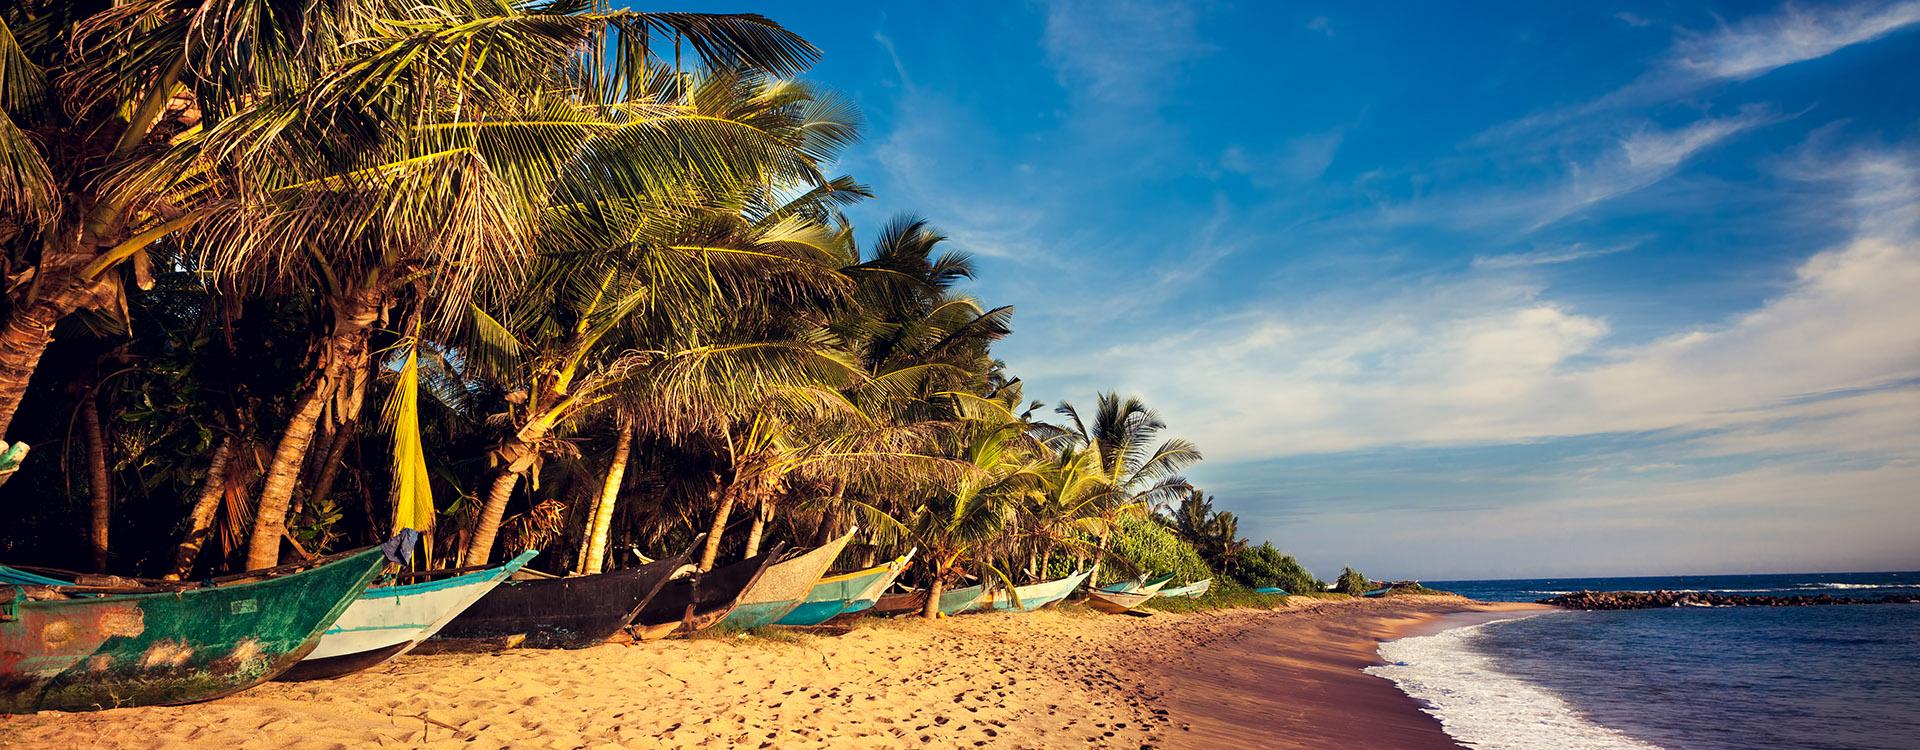 Boats on a Tropical Beach, Mirissa, South Sri Lanka